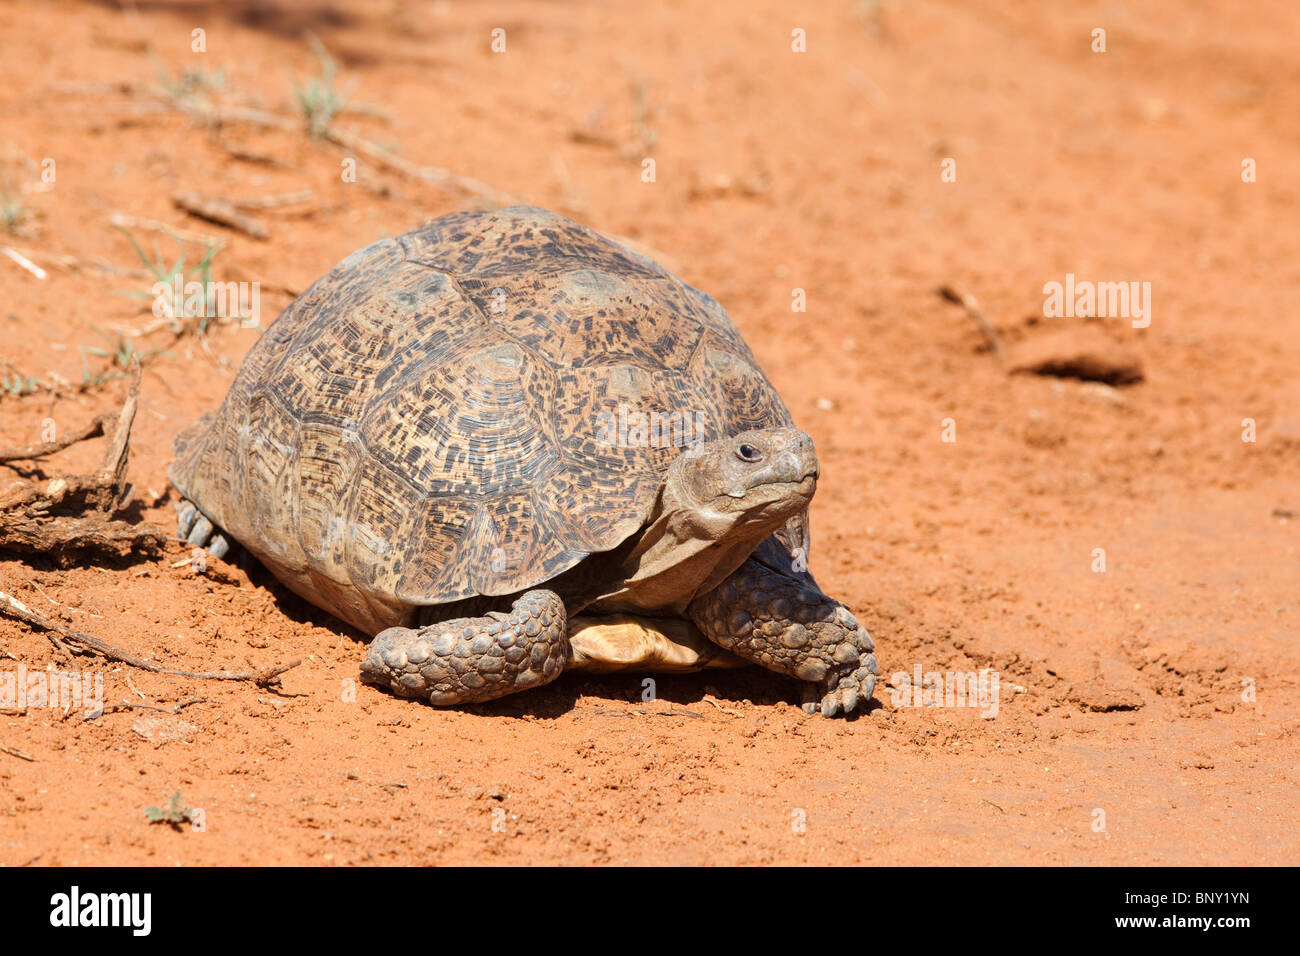 Leopard (Mountain) Tortoise, Geochelone pardalis, Kgalagadi transfrontier park, South Africa Stock Photo